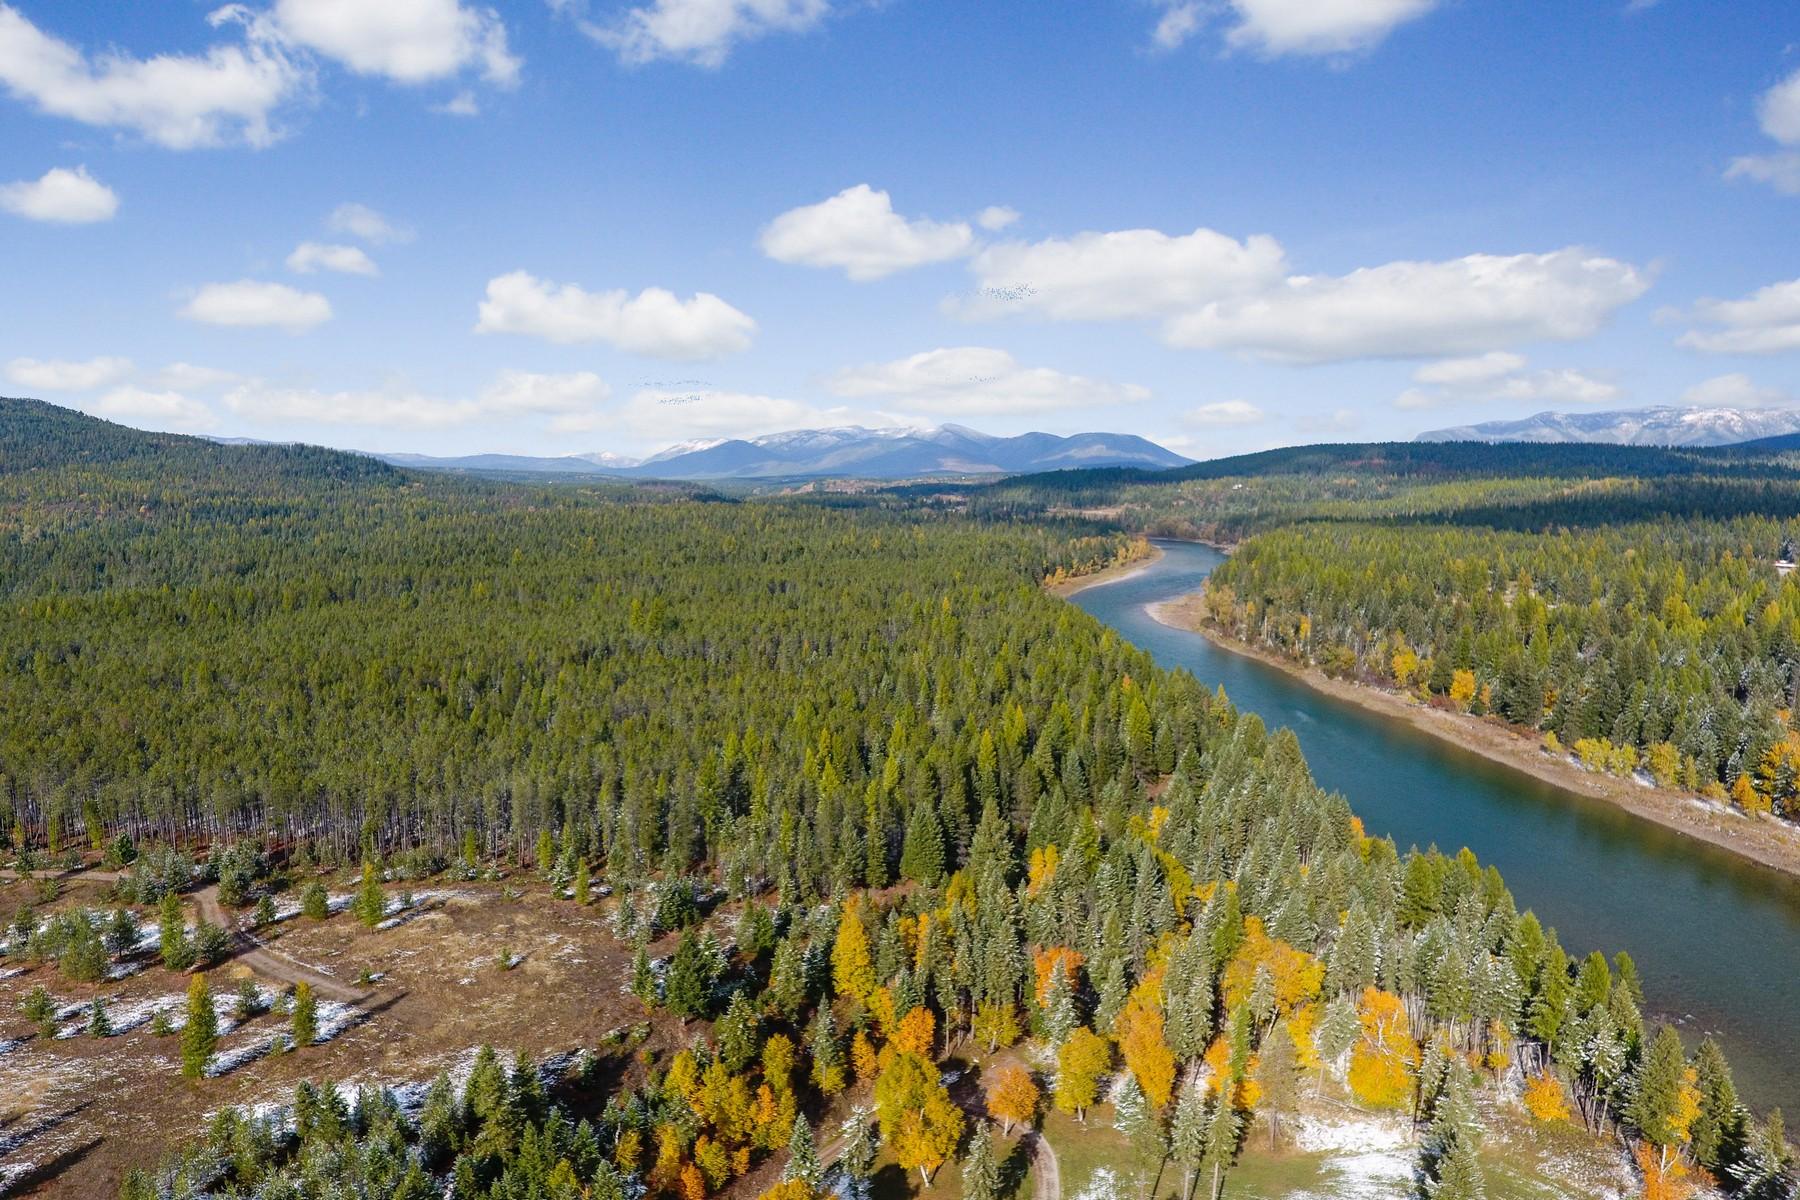 Terreno por un Venta en Gated Flathead River Ranch Acreage 1451 Lake Meadow Way Columbia Falls, Montana 59912 Estados Unidos